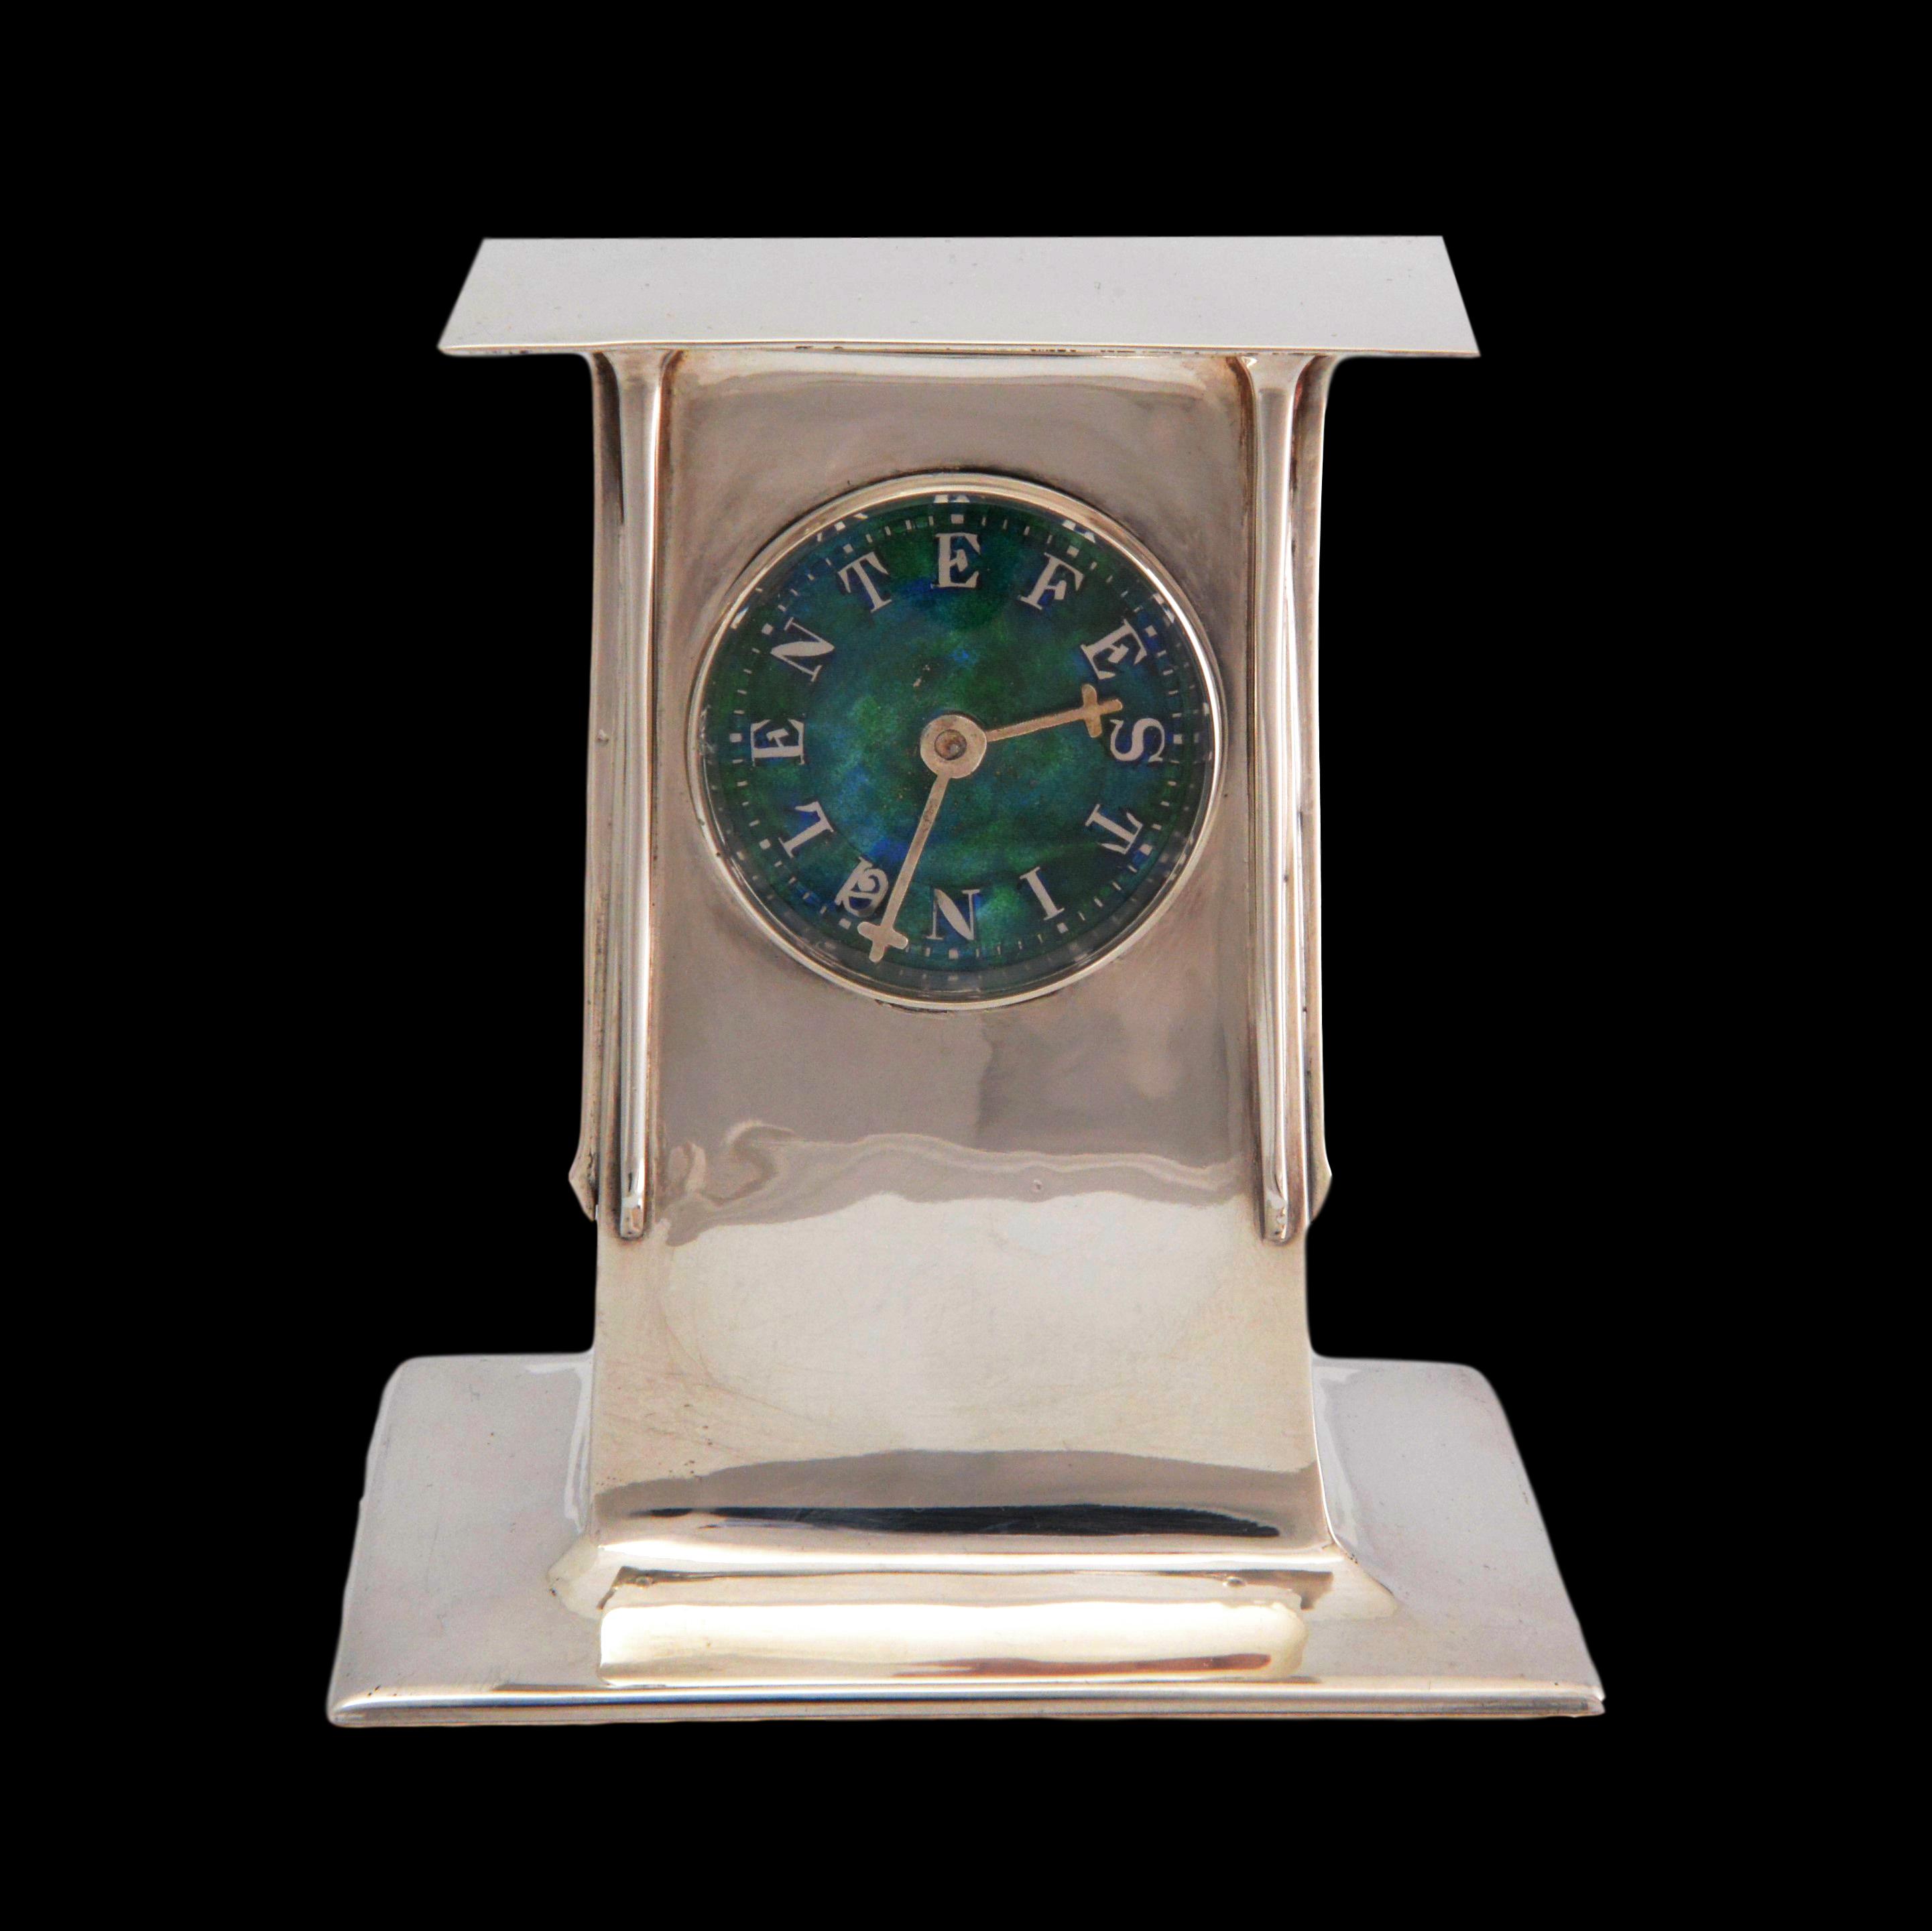 Archibald Knox clock, Liberty Cymric silver